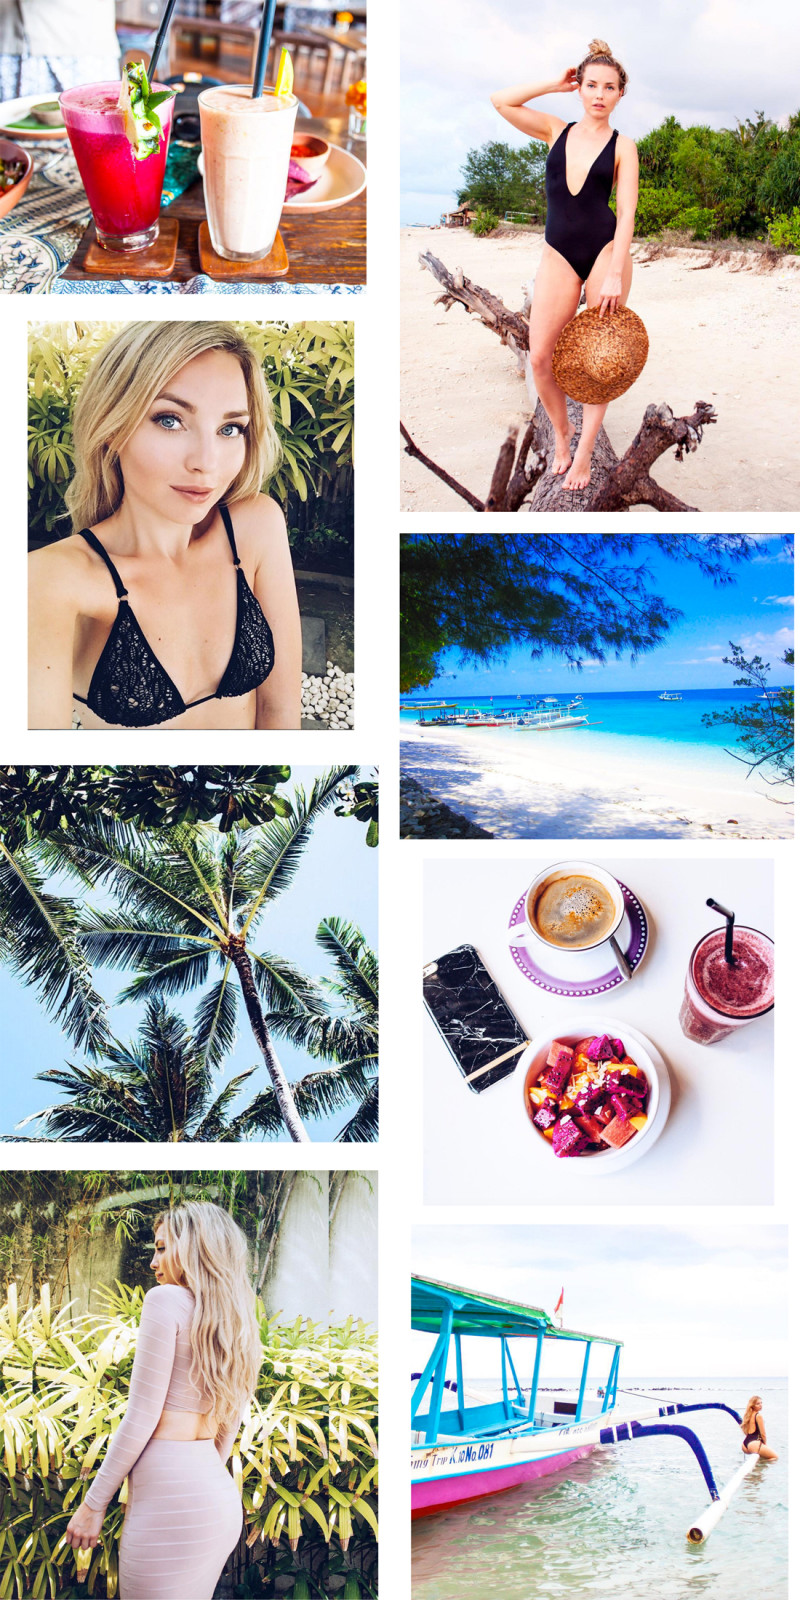 bali palm trees, cherryblossomstreet instagram, cherryblossomstreet blog, bali, bali vacation, bali vegan, bali smoothie, bali juice, gili air island, gili meno island, gili meno beach, richmondandfinch iPhone case